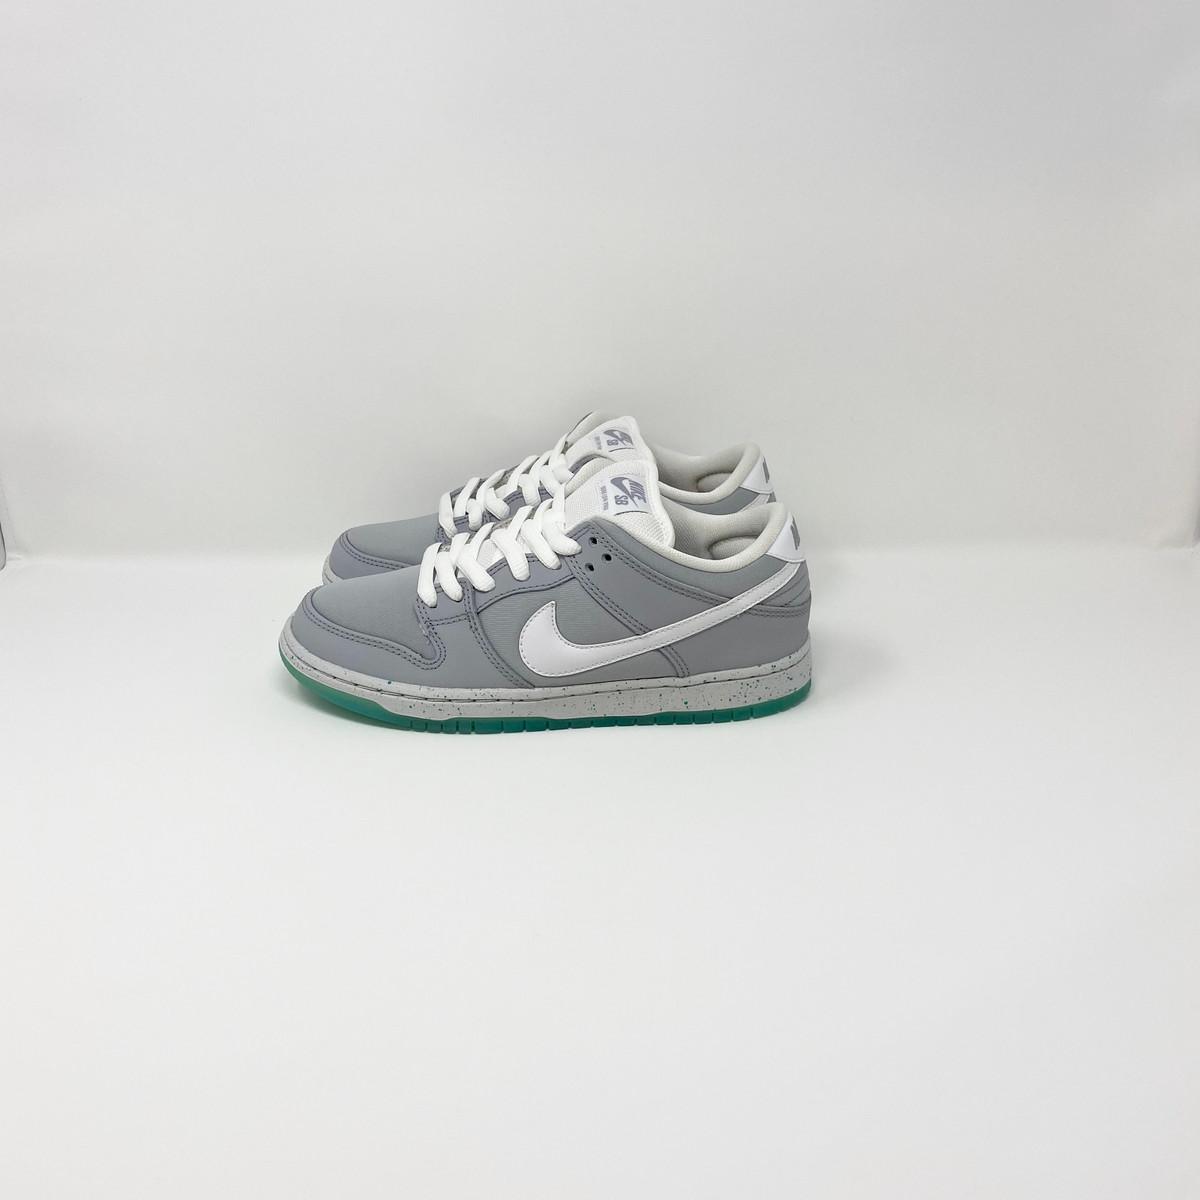 Nike Dunk Low Prem SB Marty McFly